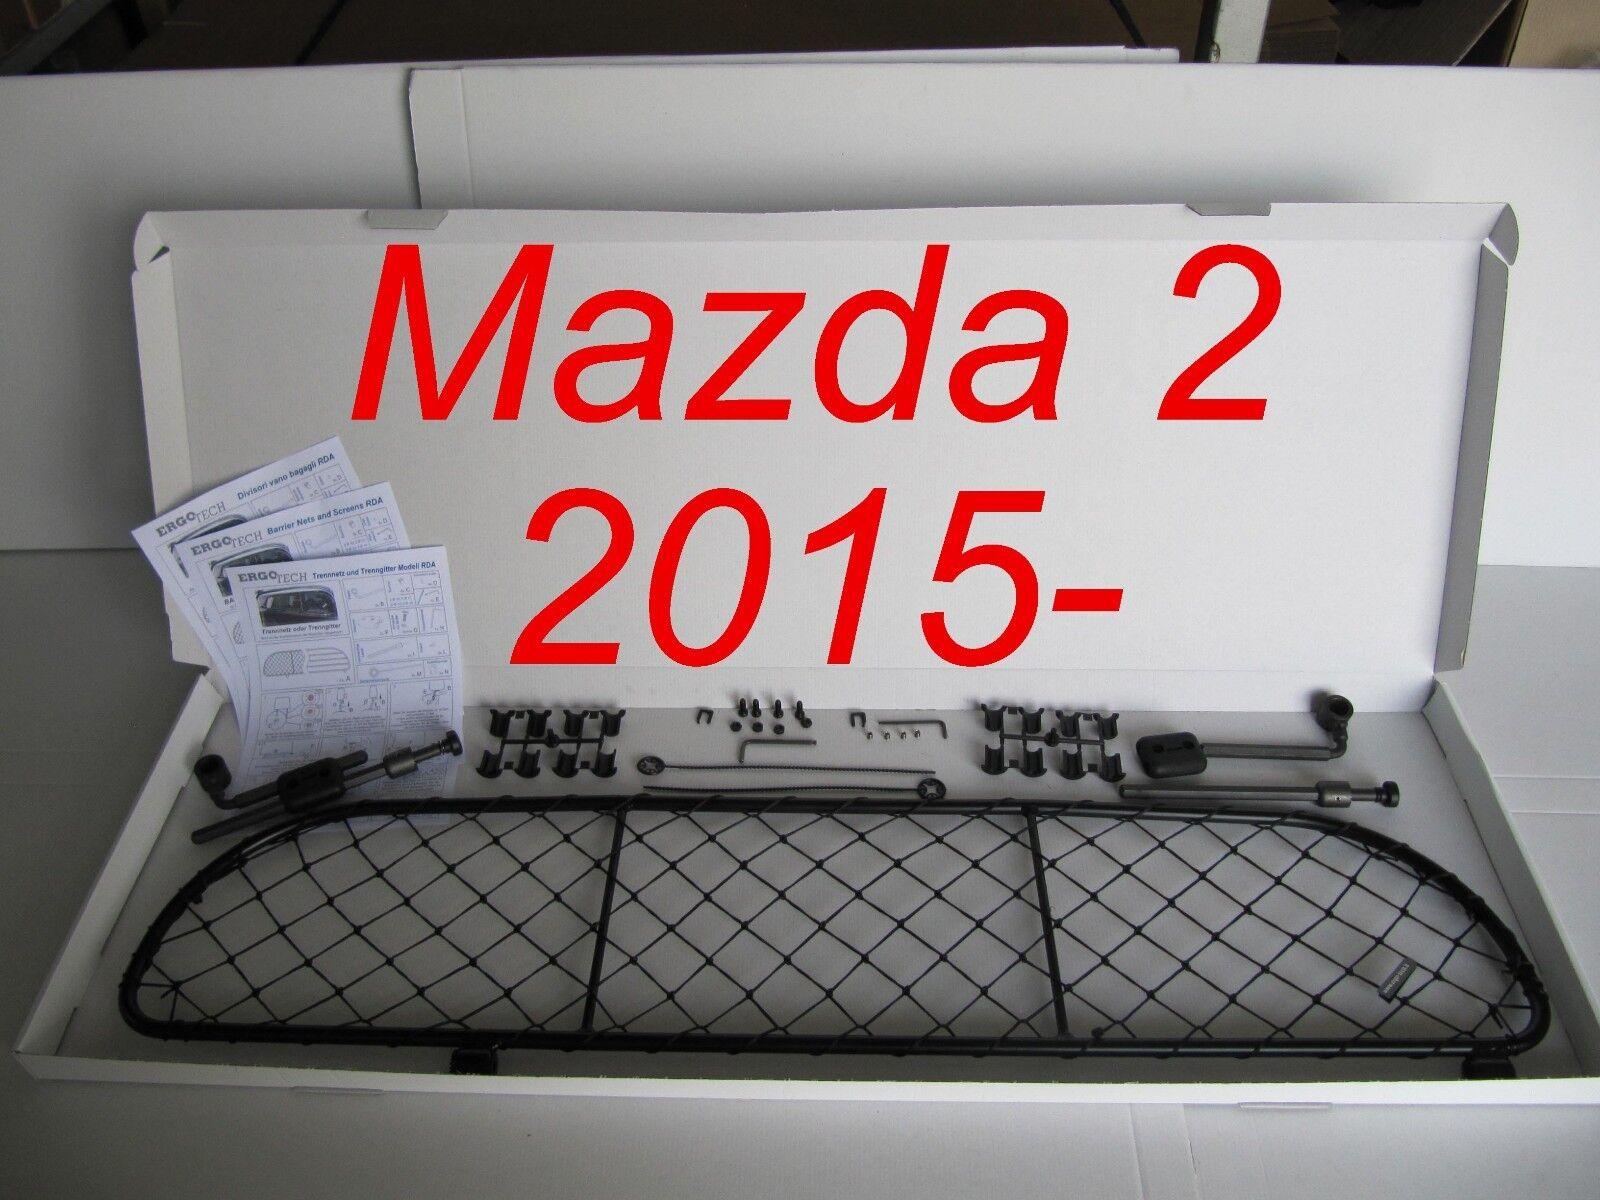 Dog Guard, Pet Barrier Net and Screen MAZDA 2 2015-